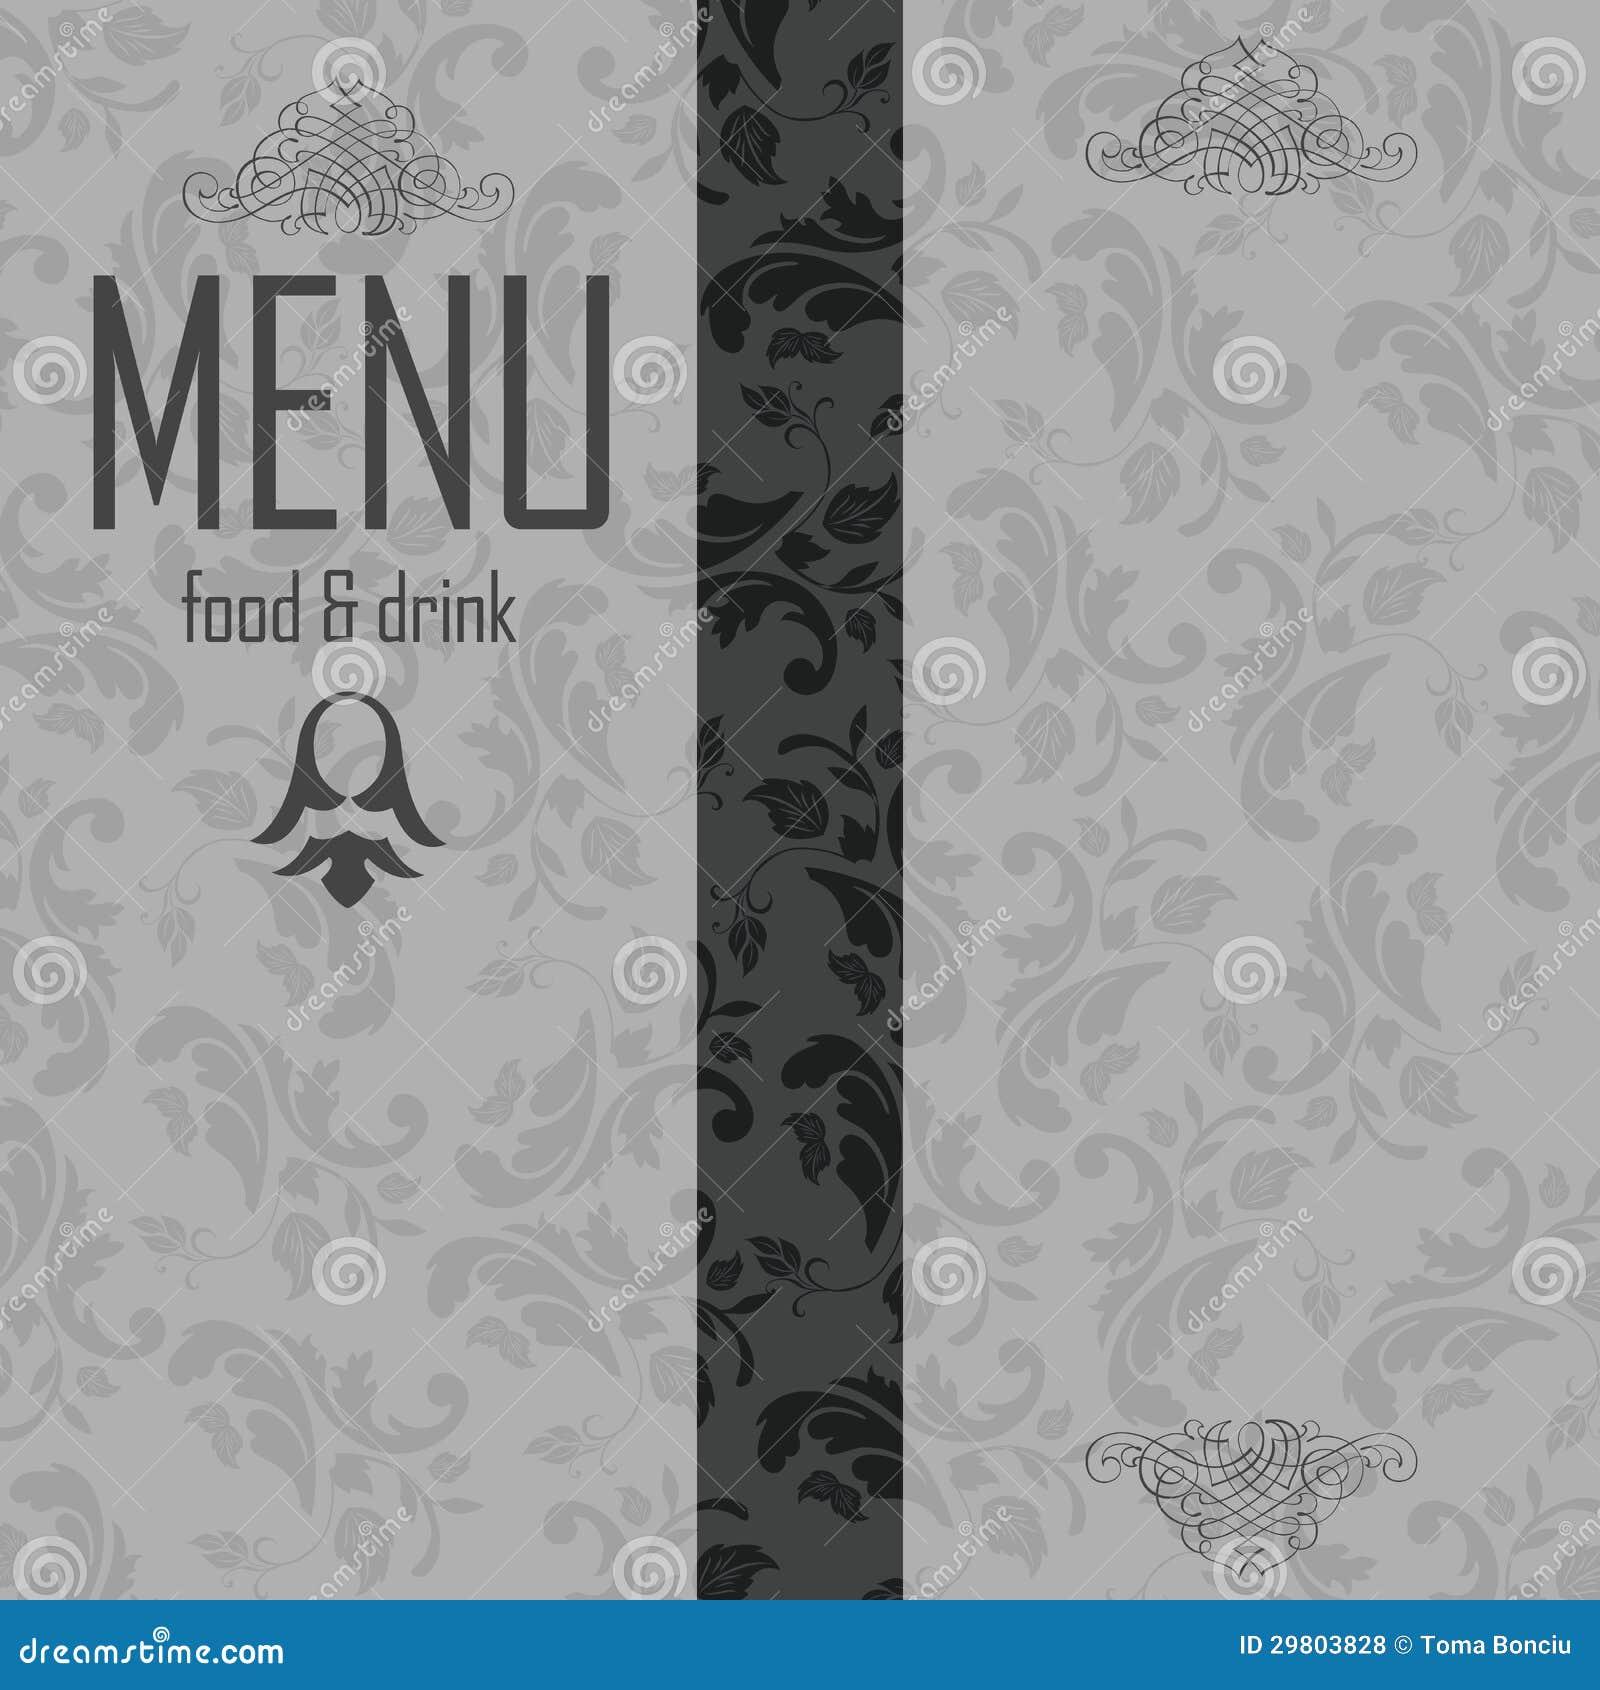 Elegant Restaurant Menu Design Stock Illustration Illustration Of Bistro Dish 29803828